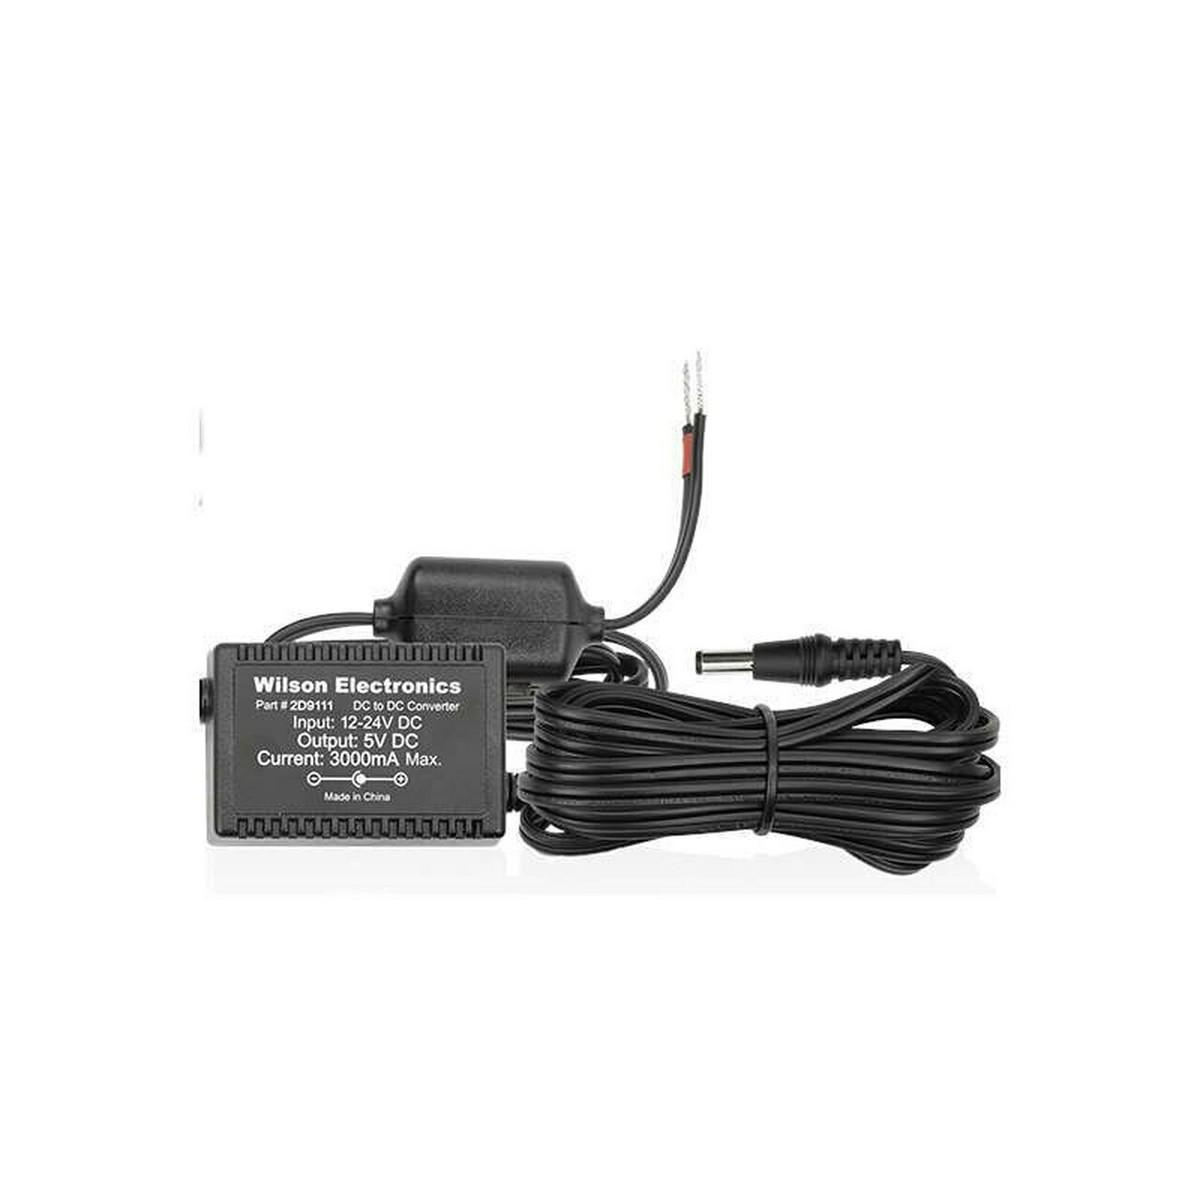 Wilson Hardwire Power Supply for Drive Reach Fleet Signal Booster | 850022